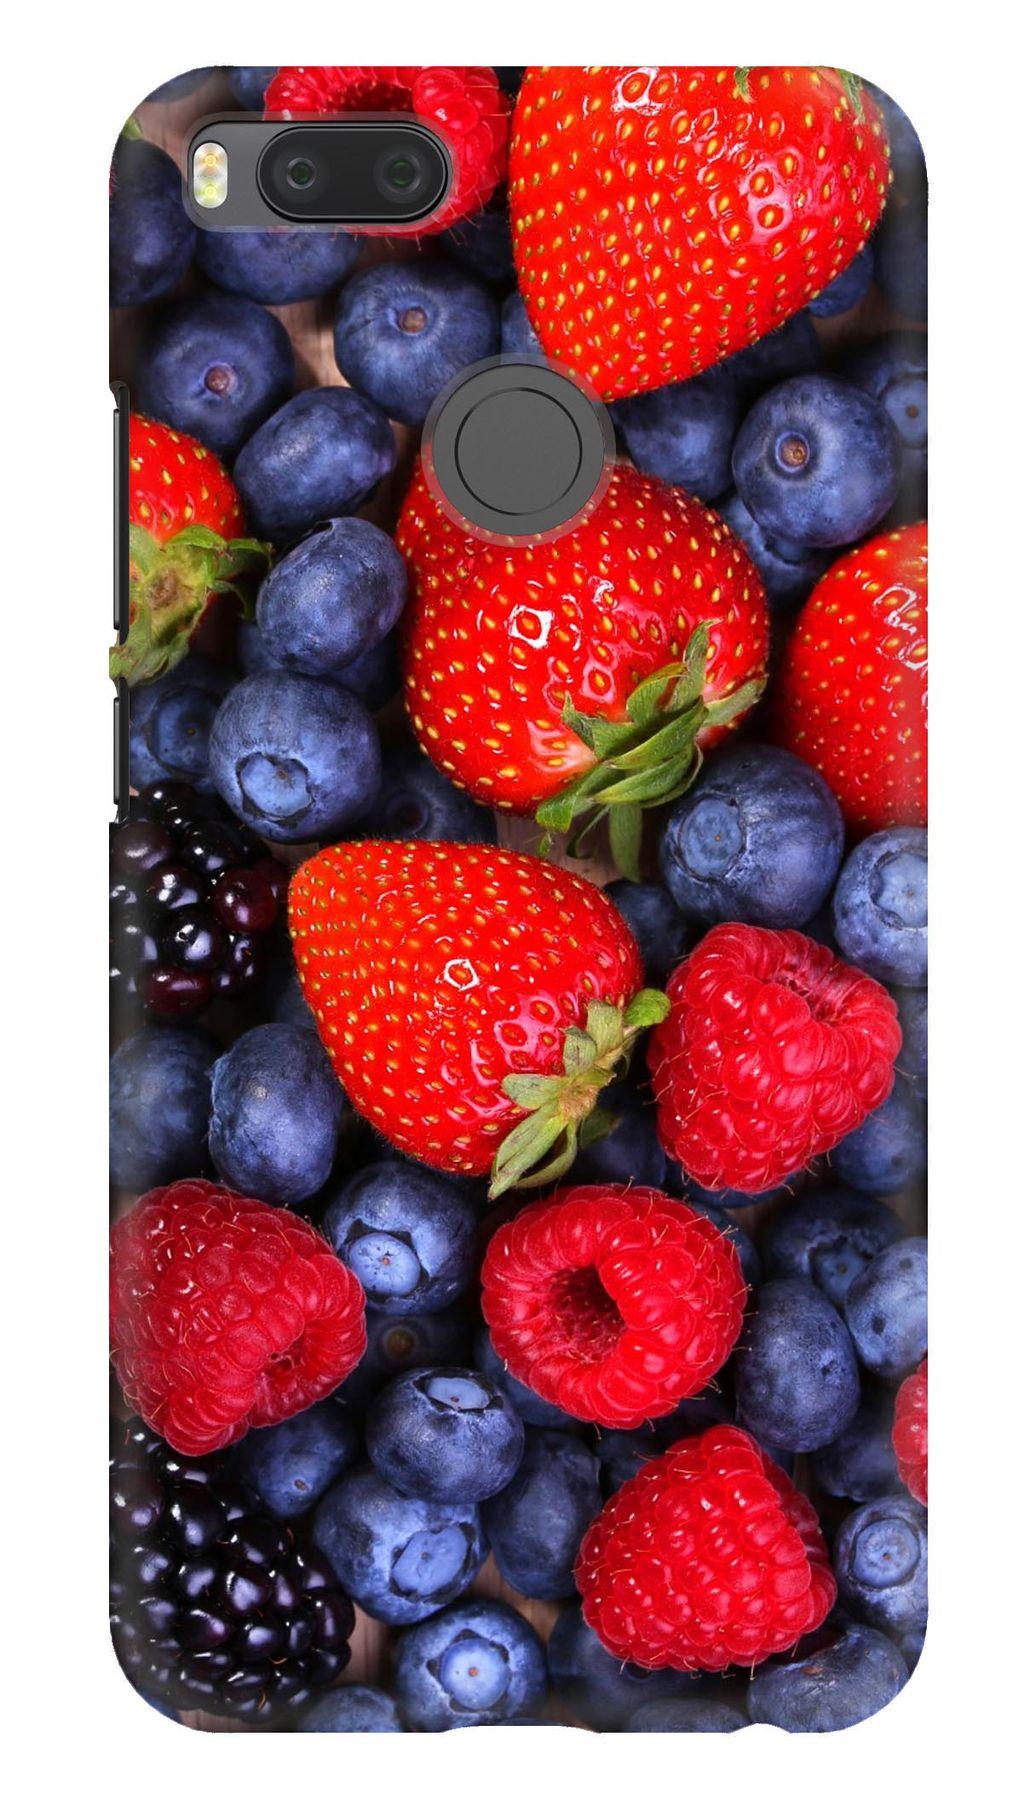 Чохол з ягодами на Xiaomi Mi A1   5x яскравий a1050f0d5e93e